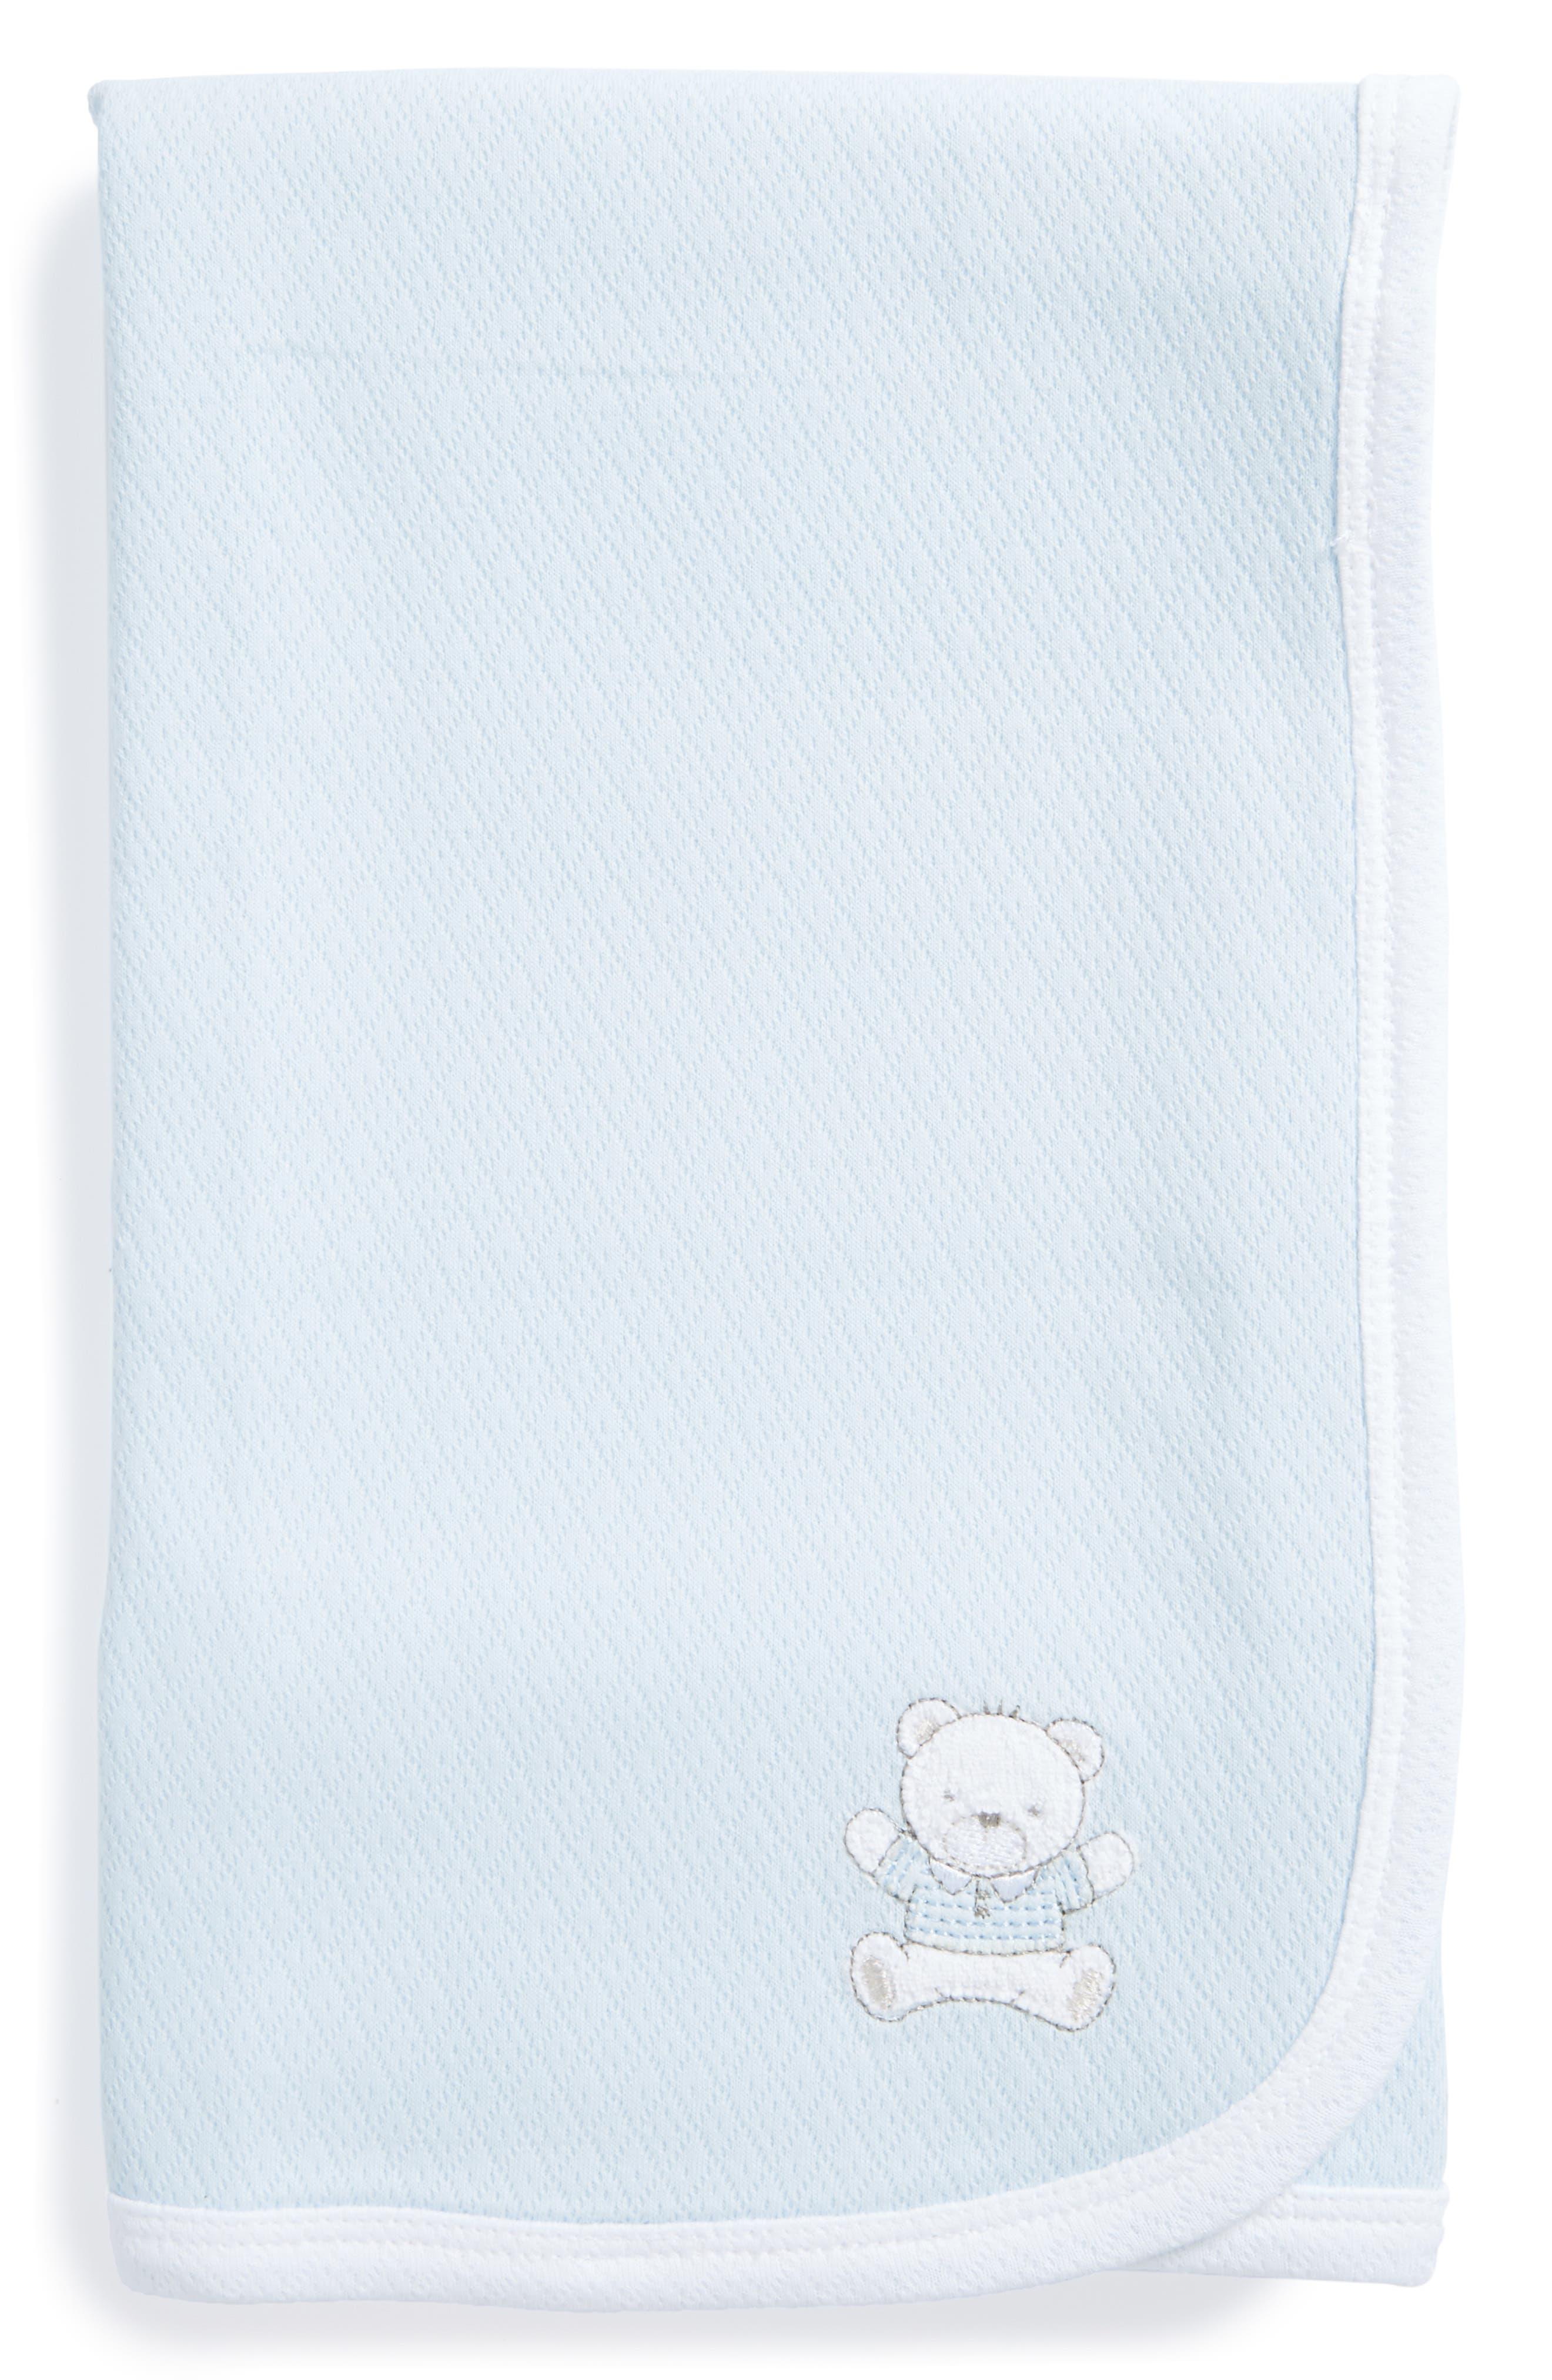 Bear Receiving Blanket,                             Main thumbnail 1, color,